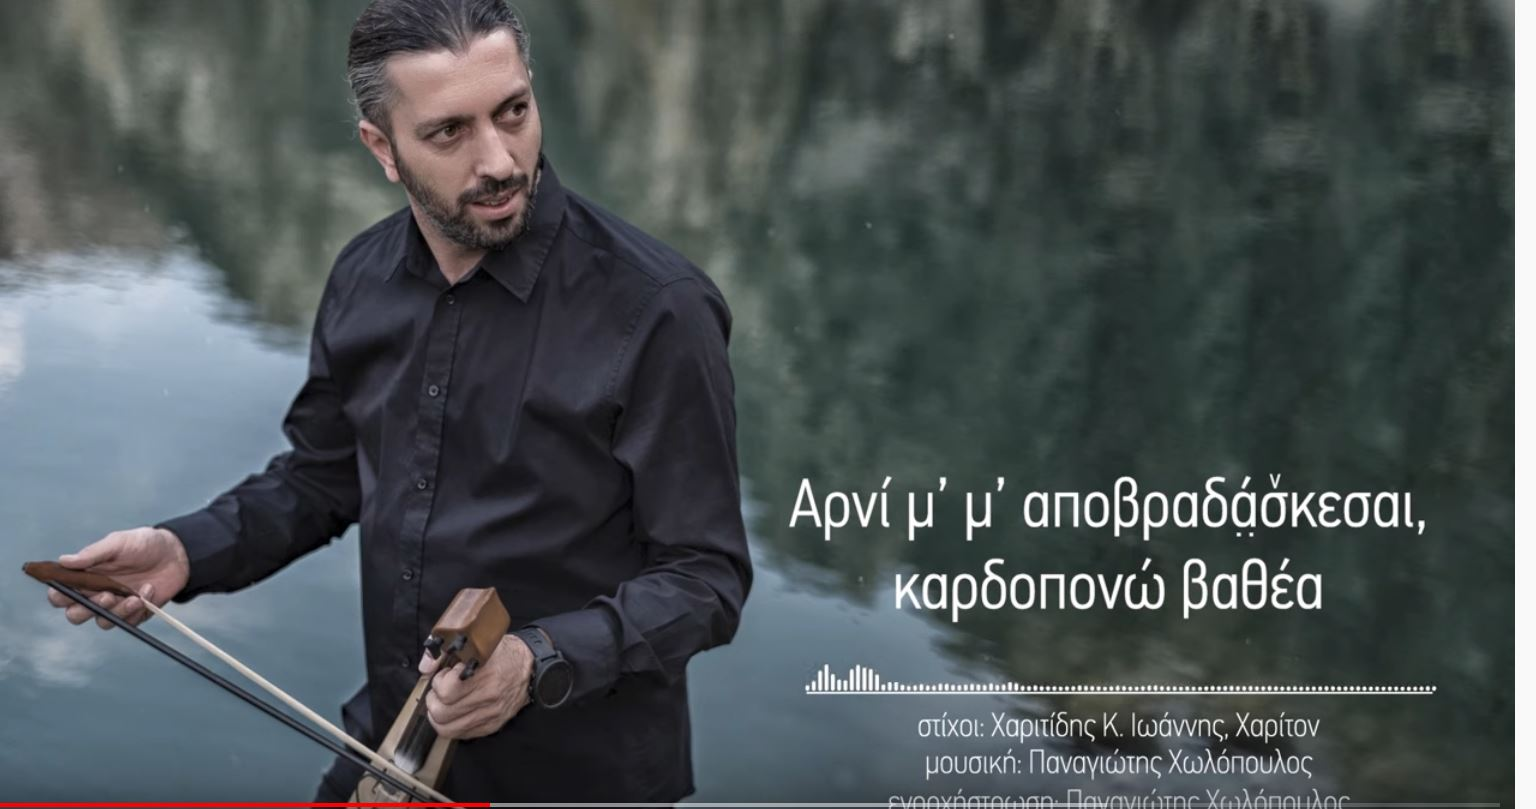 "kozan.gr: ""Αρνί μ' μ' αποβραδάσκεσαι"", το νέο τραγούδι του Παναγιώτη Χωλόπουλου από το Μαυροδένδρι Κοζάνης (Βίντεο)"